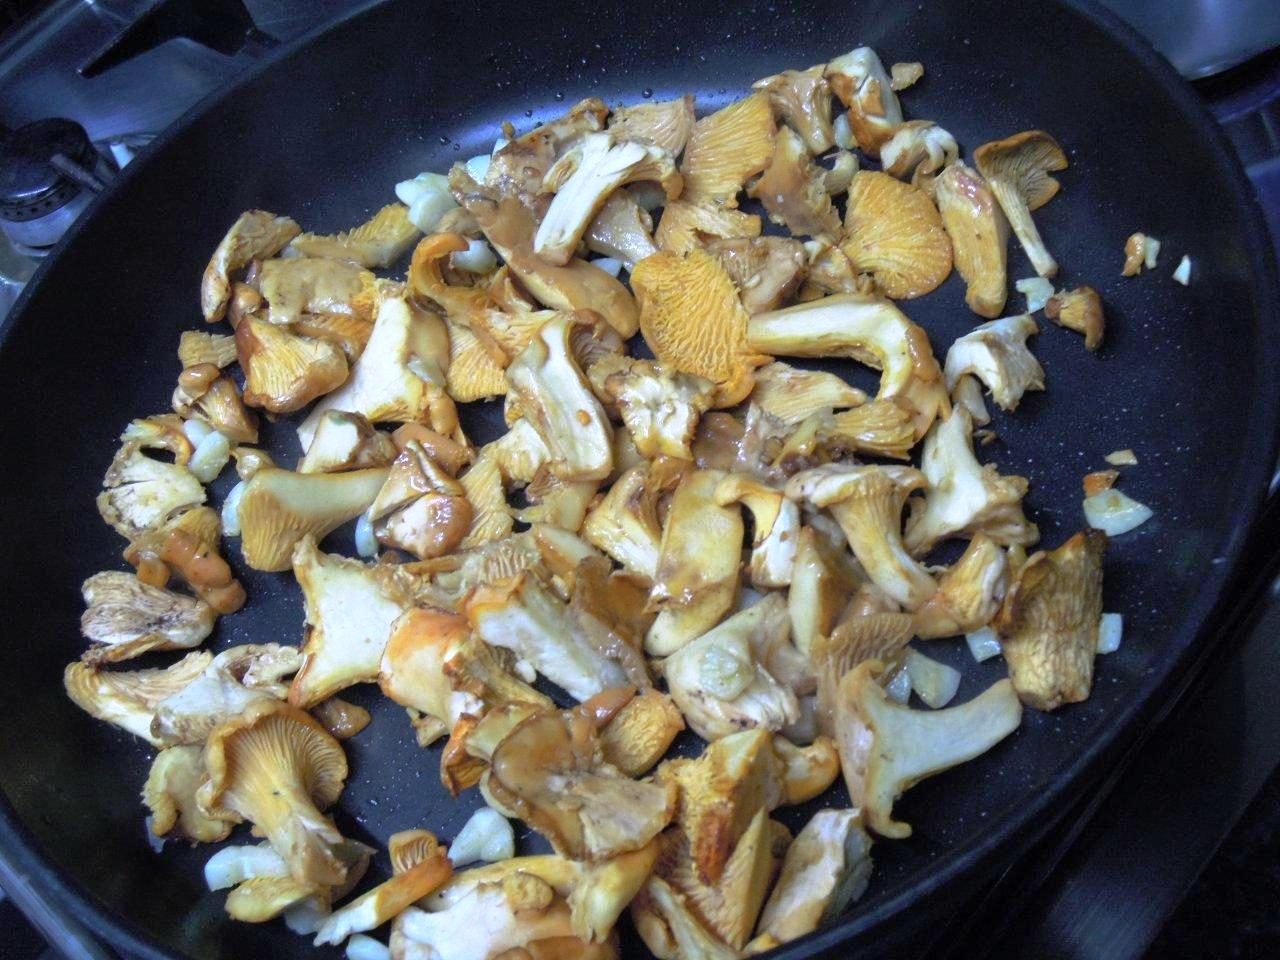 Caril de Cogumelos, cogumelos na frigideira - Grafe e Faca